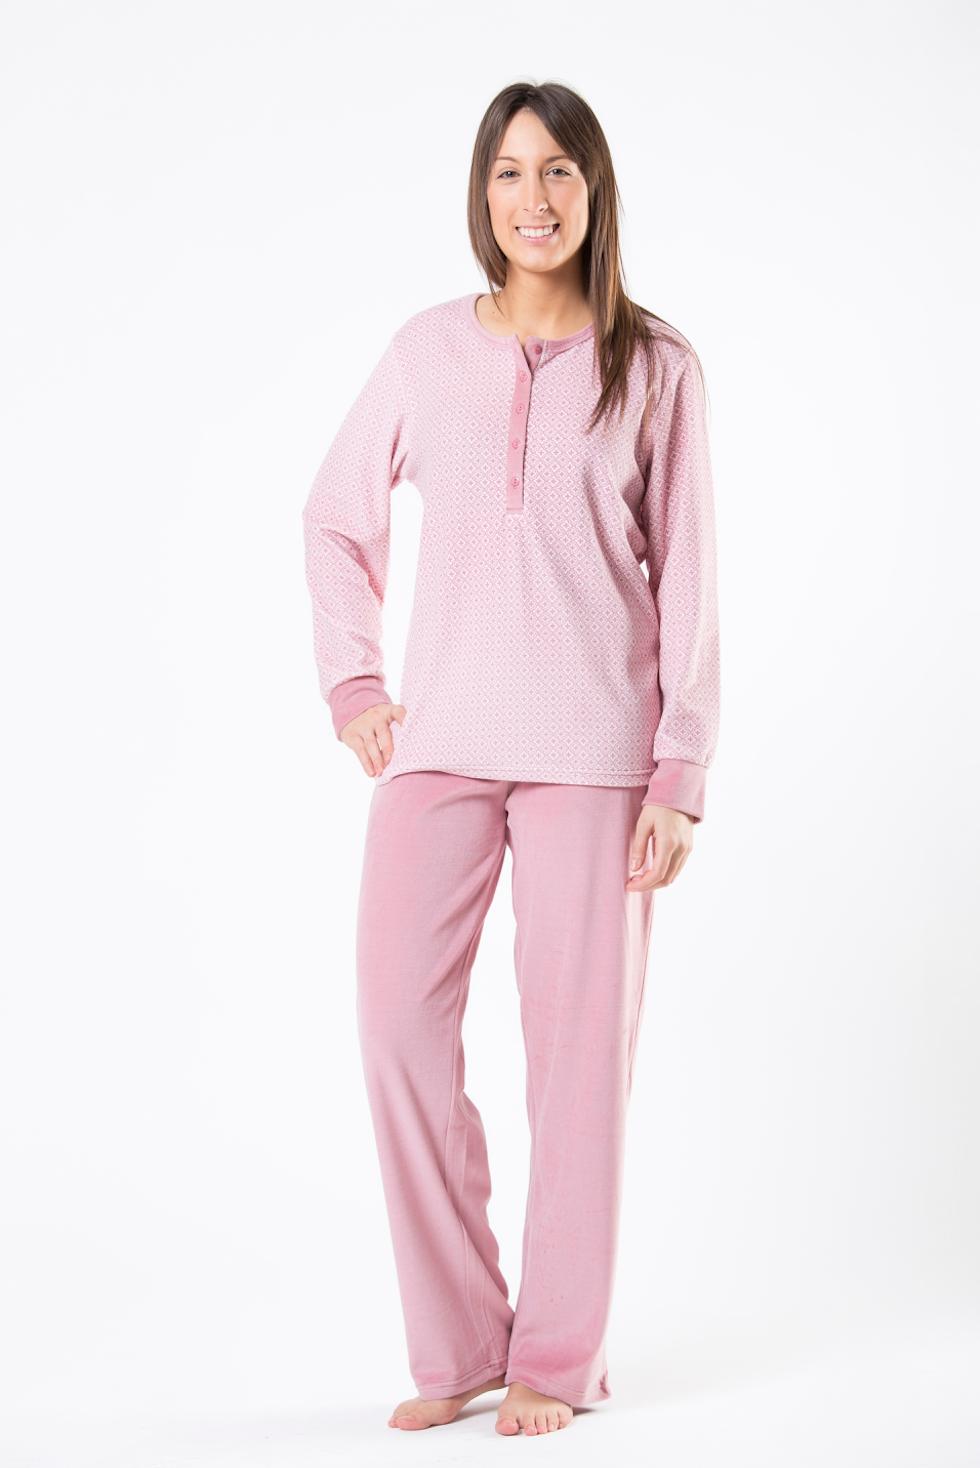 pijama mujer rosa Woman fashion ropa noche Cue pijama bata mujer ...